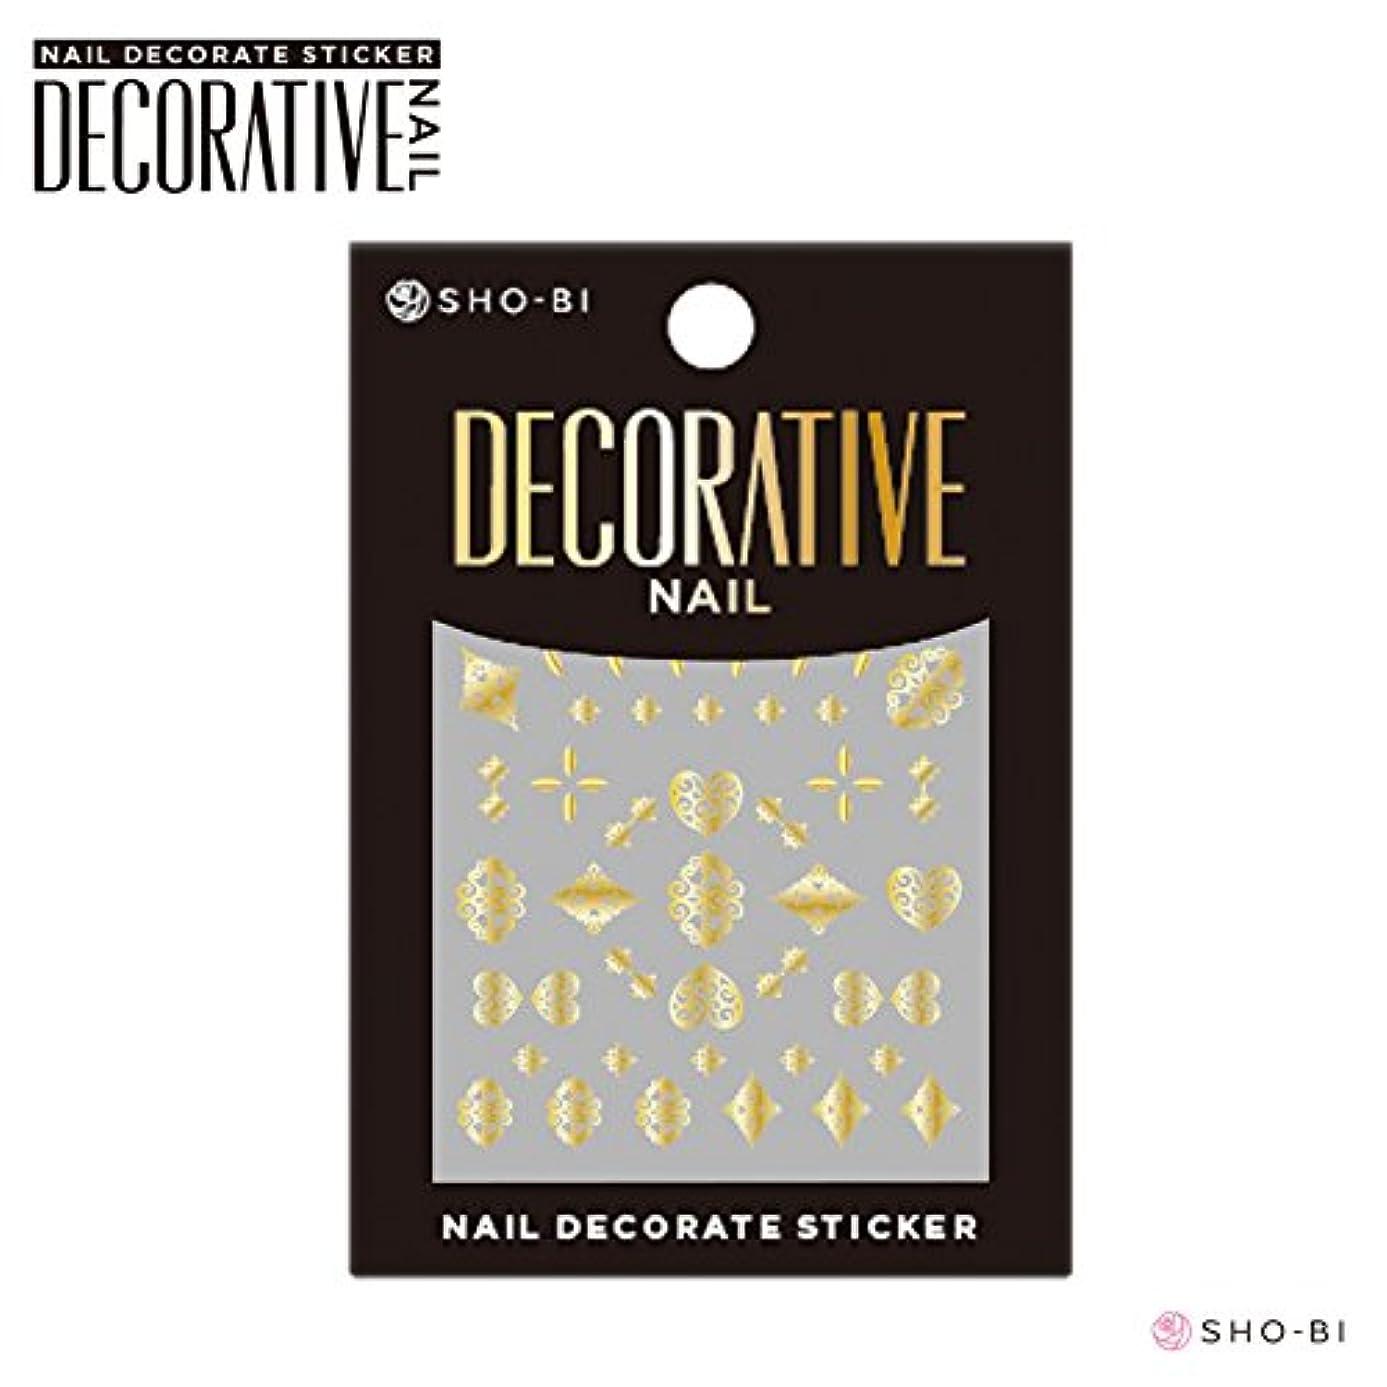 Decorative Nail カラーオーバルチップ2 パステルブルー